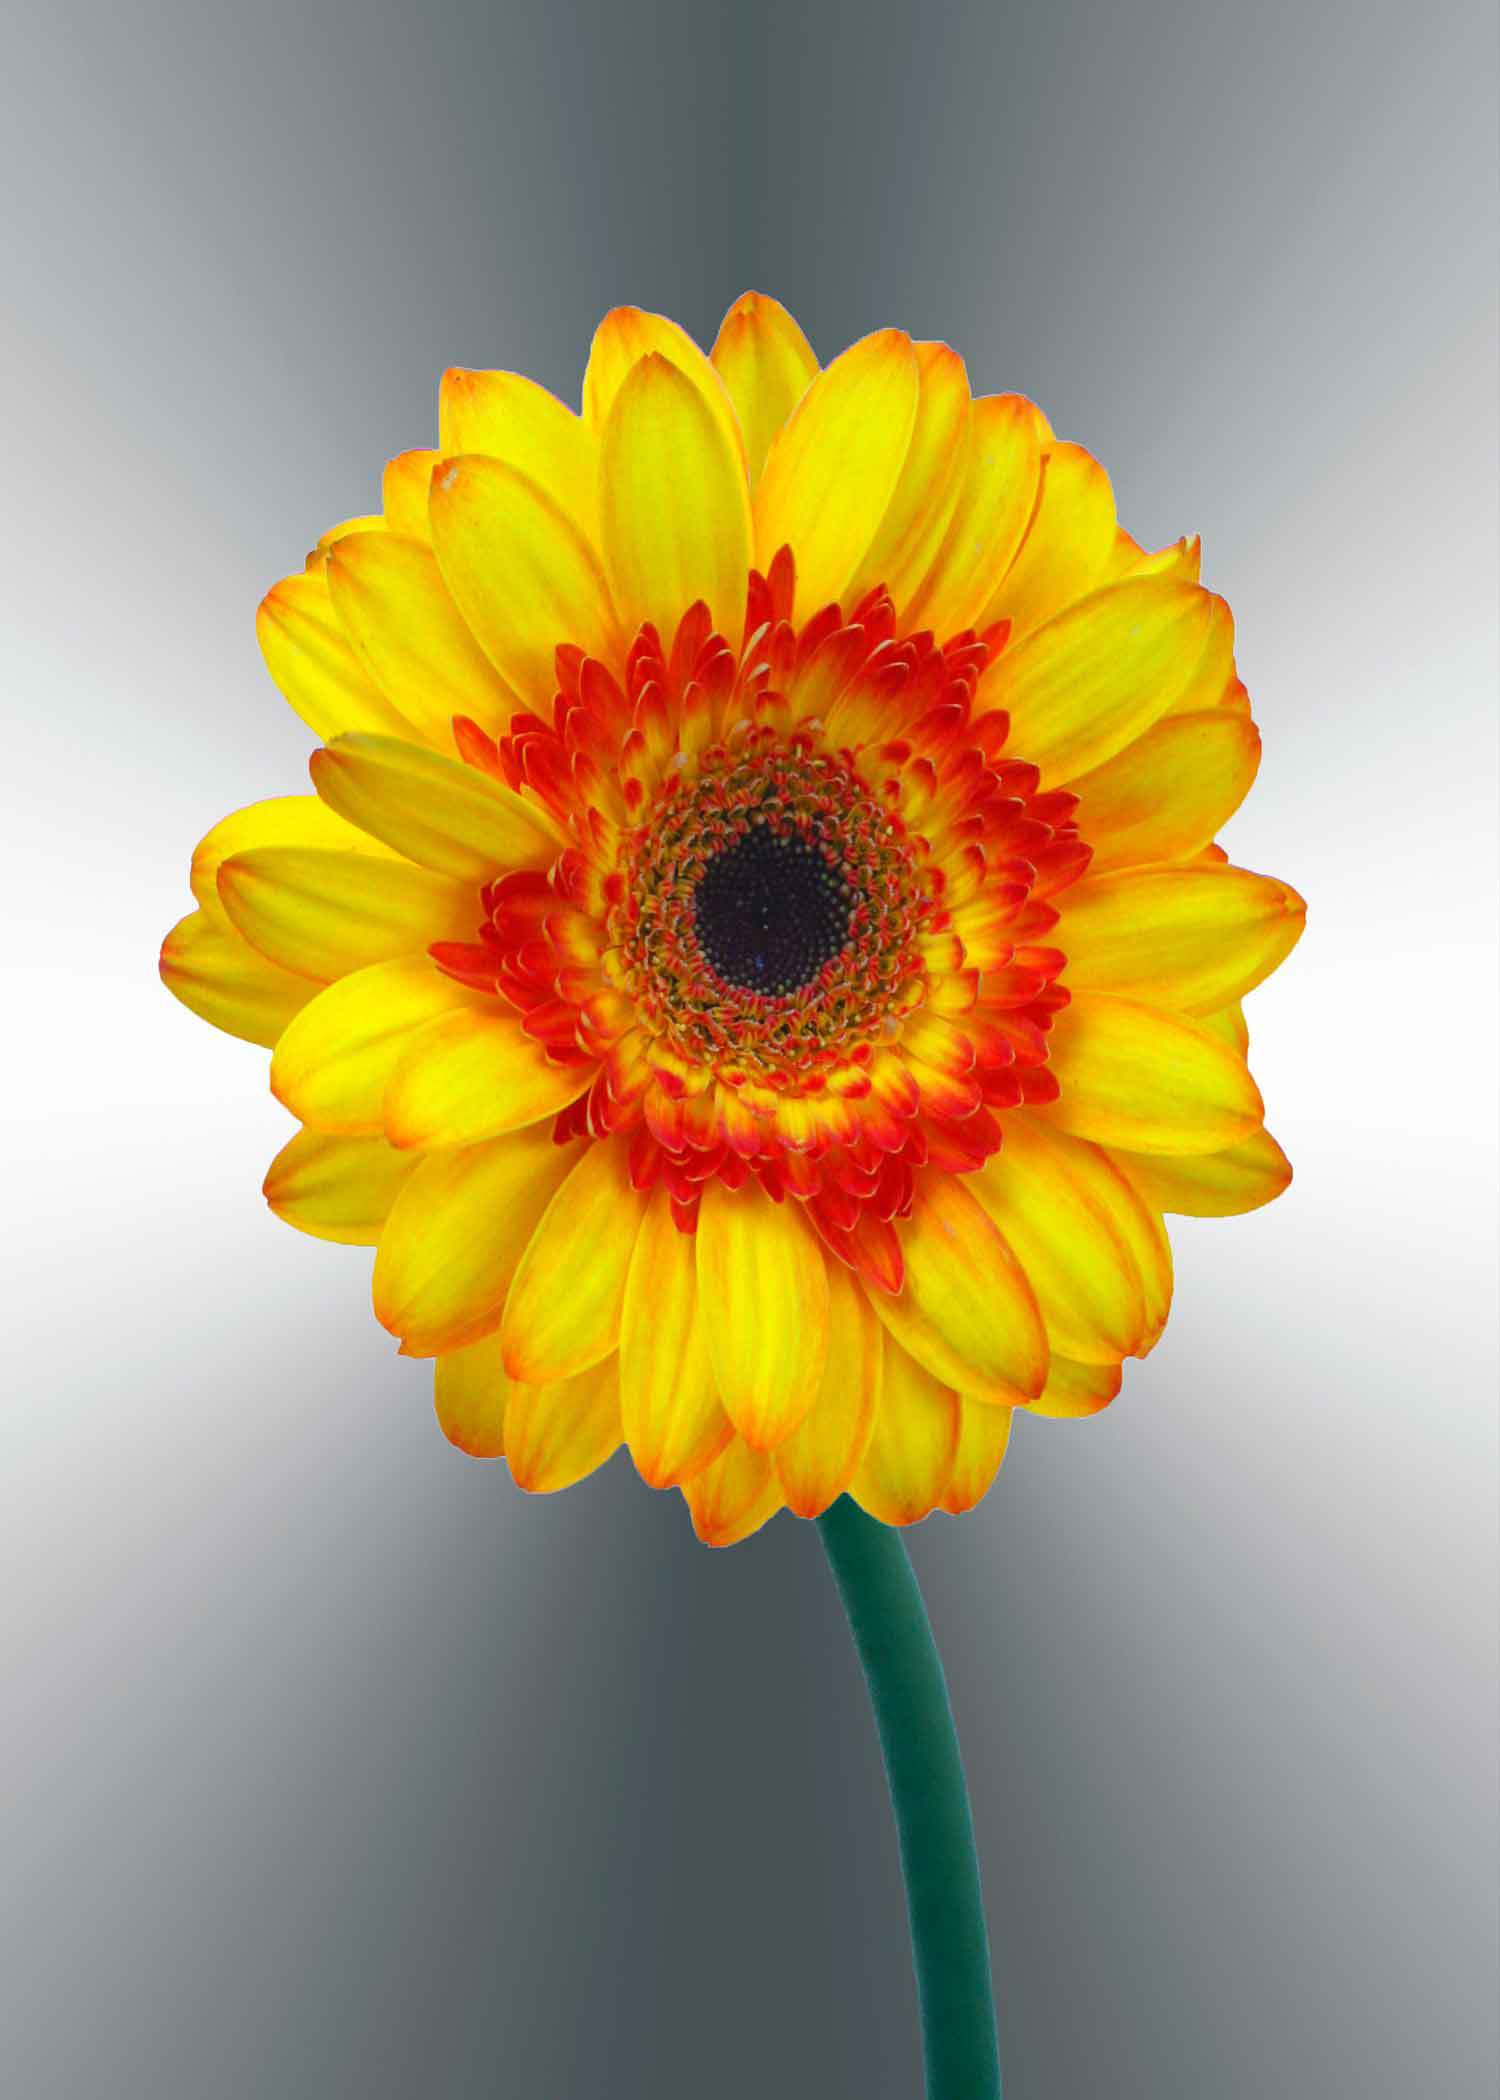 yellow-gerger-daisy-5x7-(22-of-236)-Edit-3-copy-2.jpg